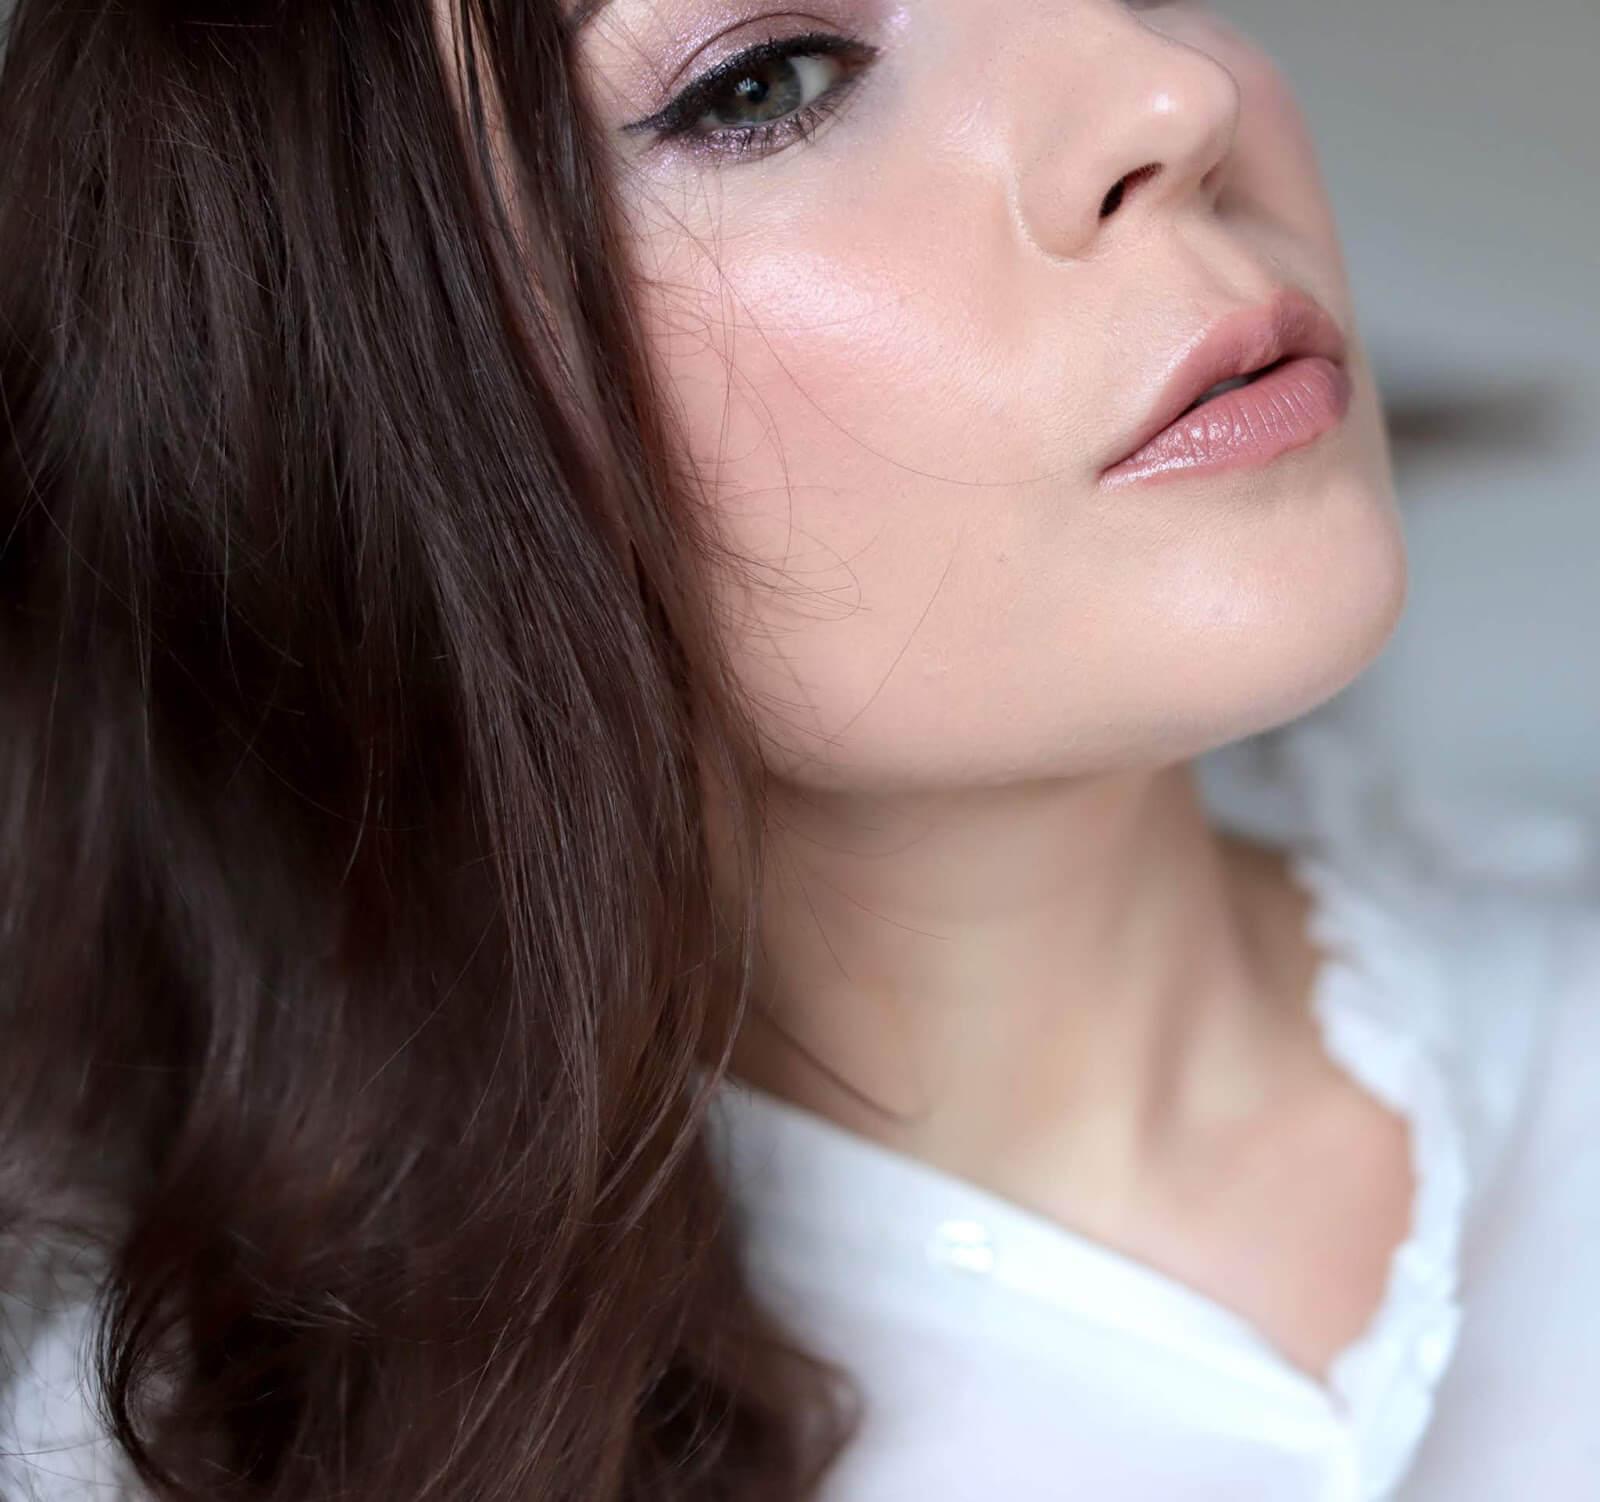 Chantecaille Maquillage Avis Blush Vibrant Lip Veil Fard A Paupières